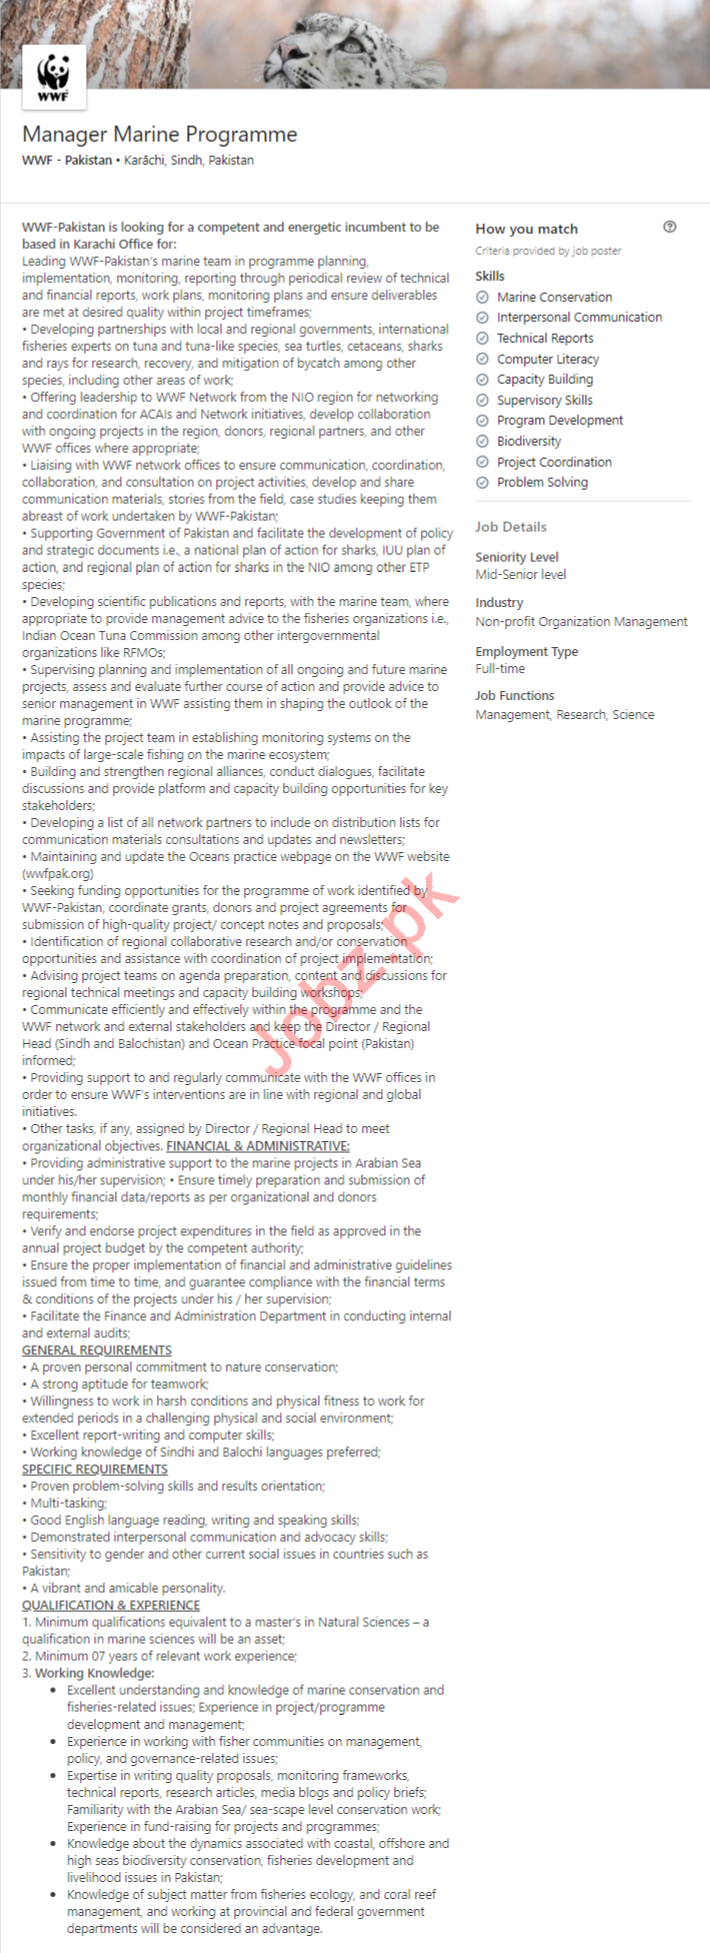 Manager Marine Programme Job 2020 in Karachi